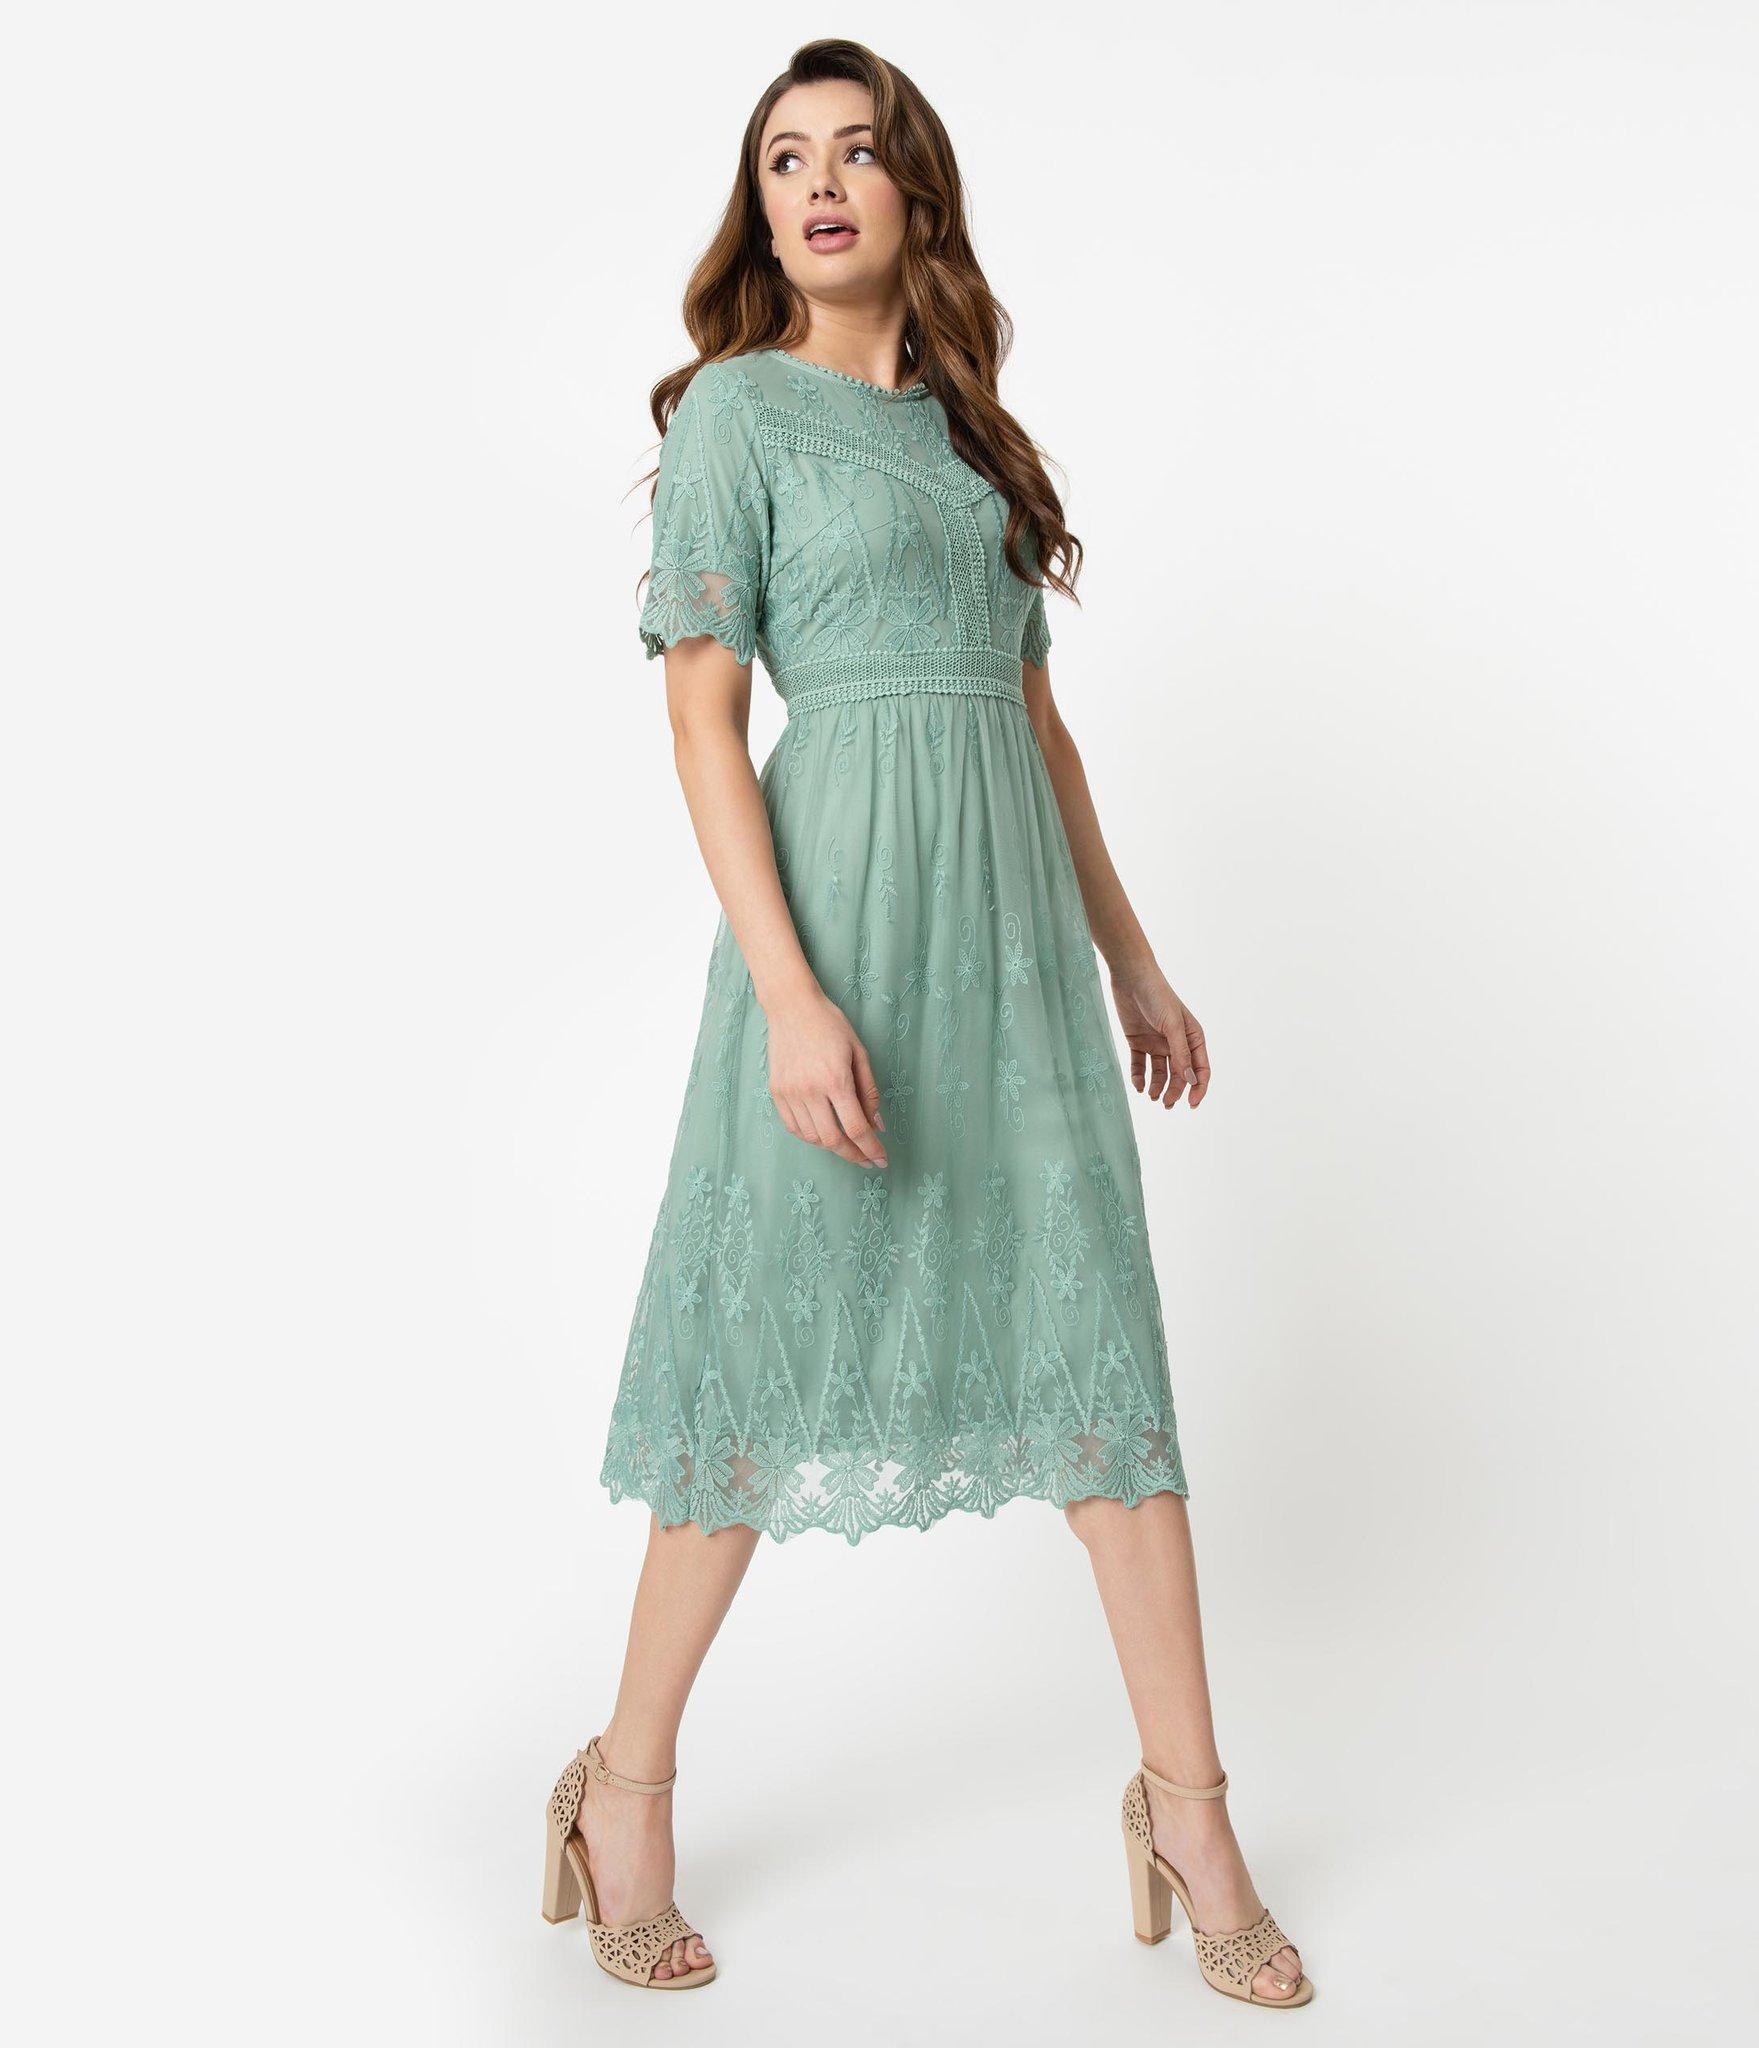 Vintage Style Sage Green Embroidered Mesh Midi Dress #sagegreendress